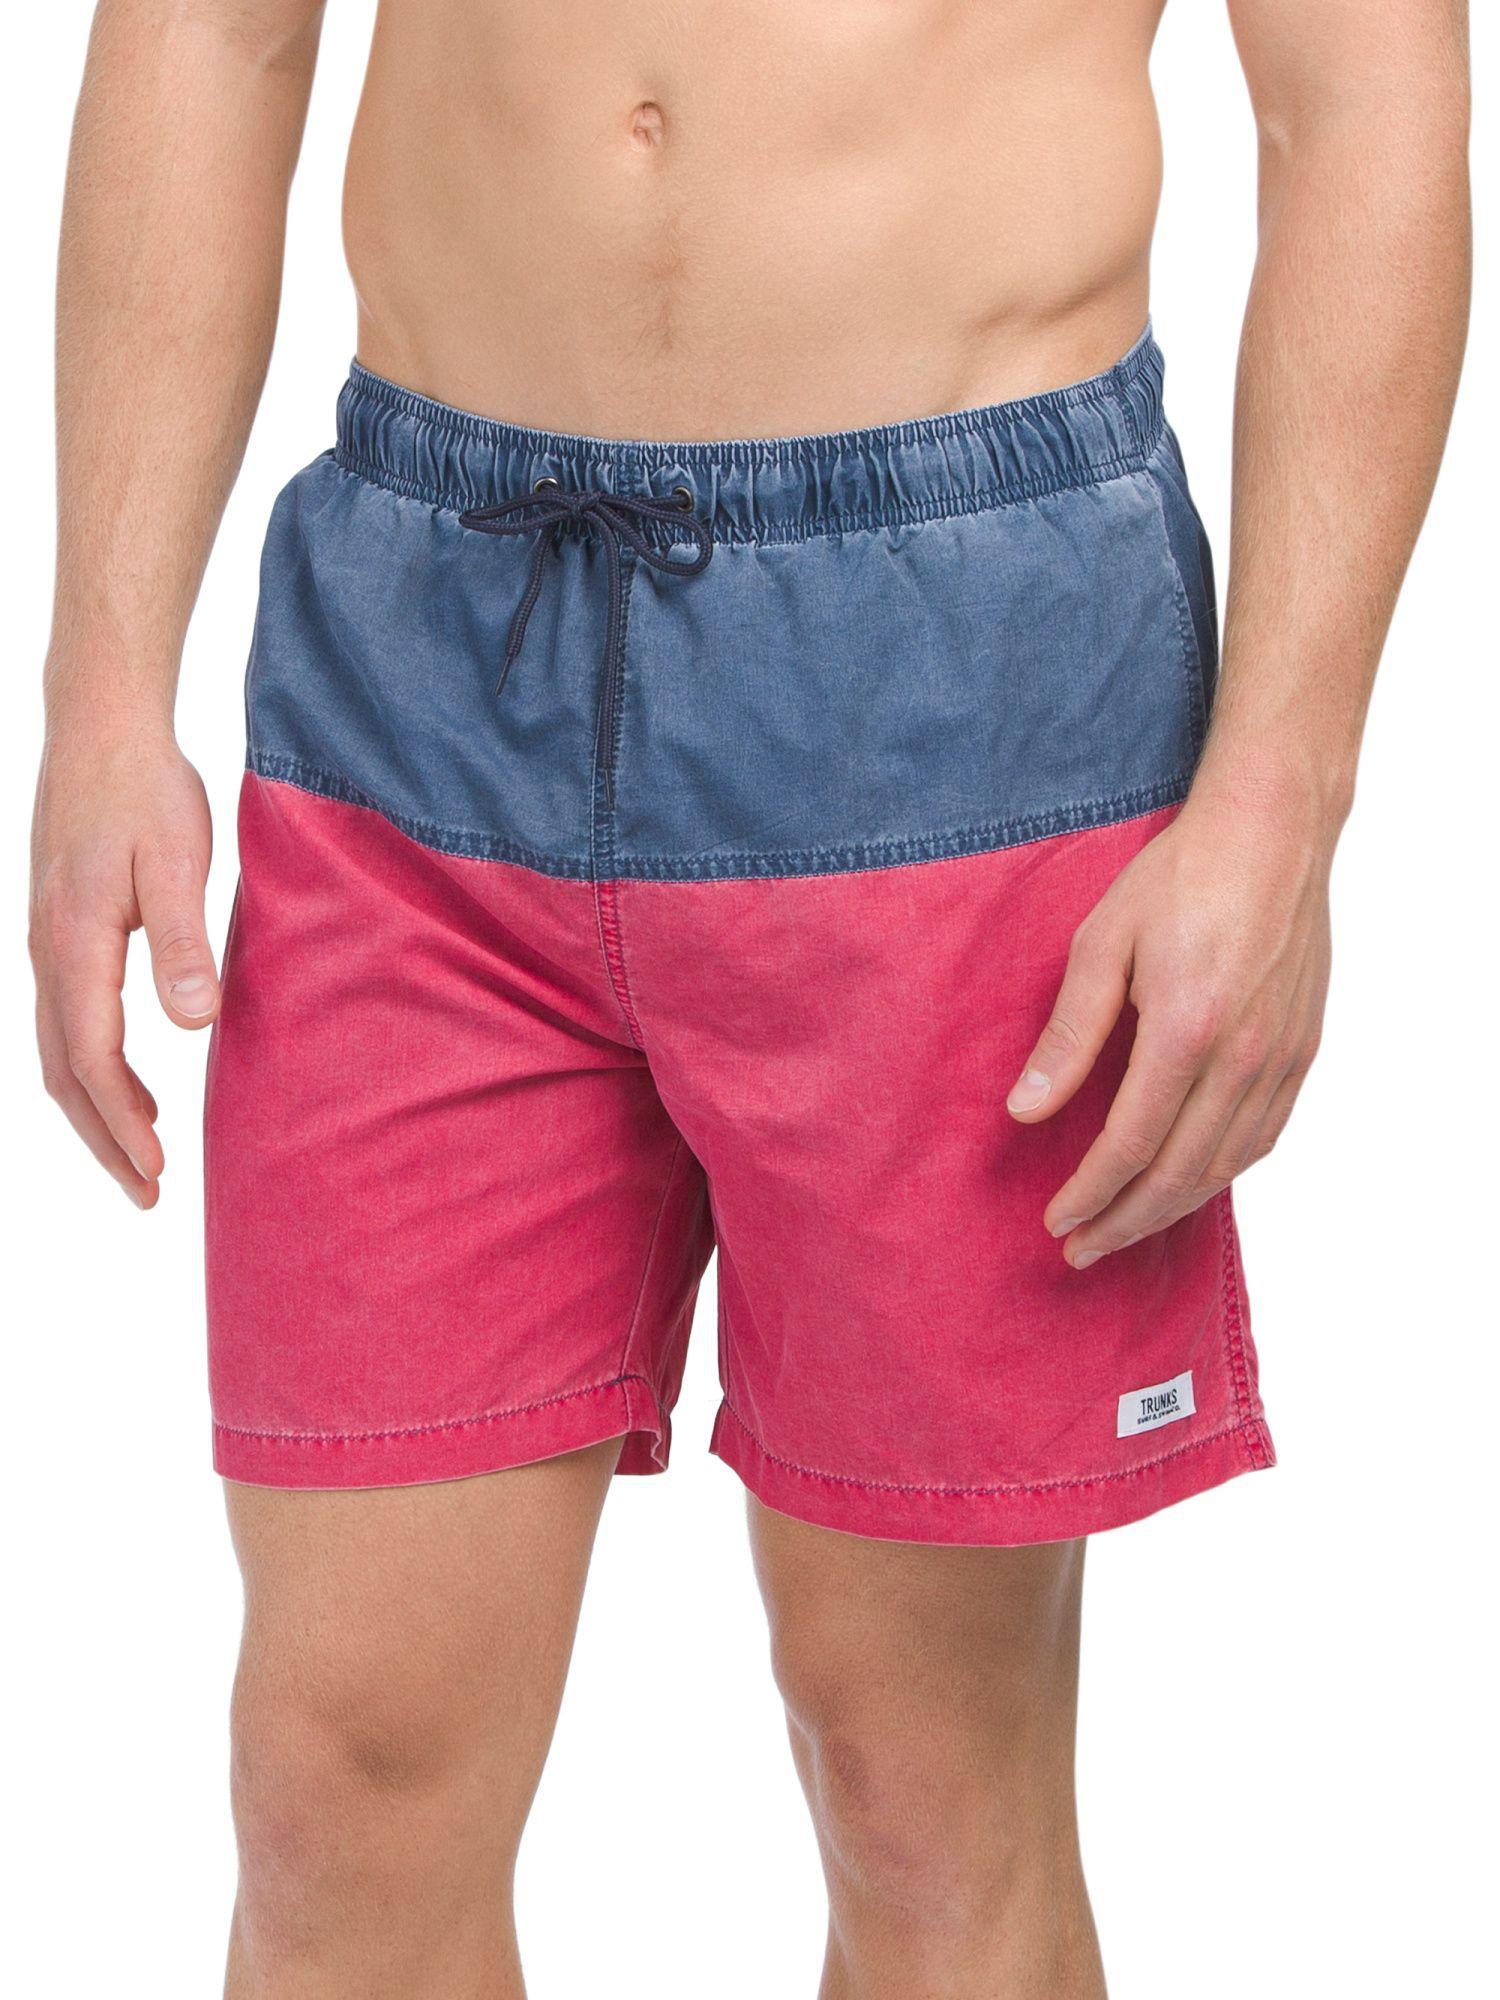 f7147b9b64 Nylon Pigment Board Shorts | Products | Drawstring waist, Swim ...